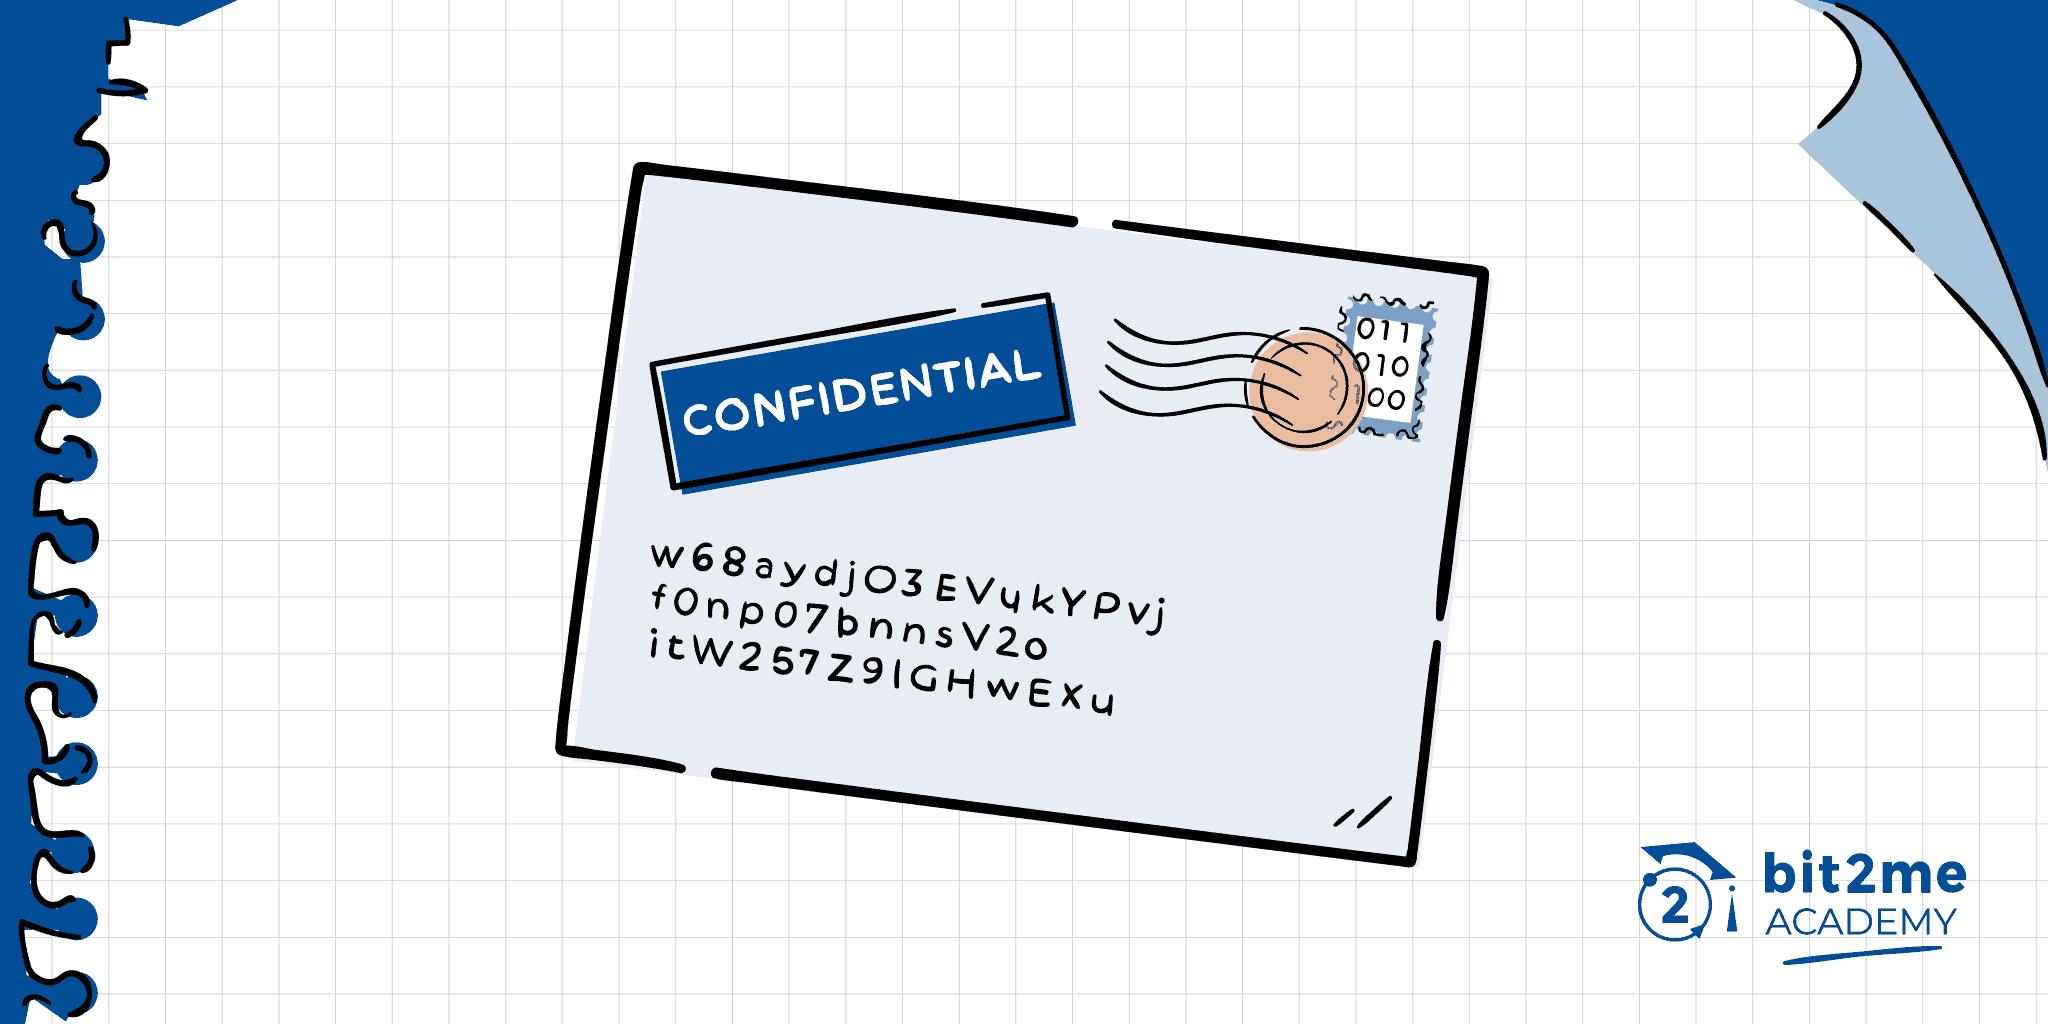 que son las confidential transactions criptomonedas, que son las confidential transactions bitcoin, que son transacciones confidenciales, que son transacciones confidenciales bitcoin, que son transacciones confidenciales criptomonedas